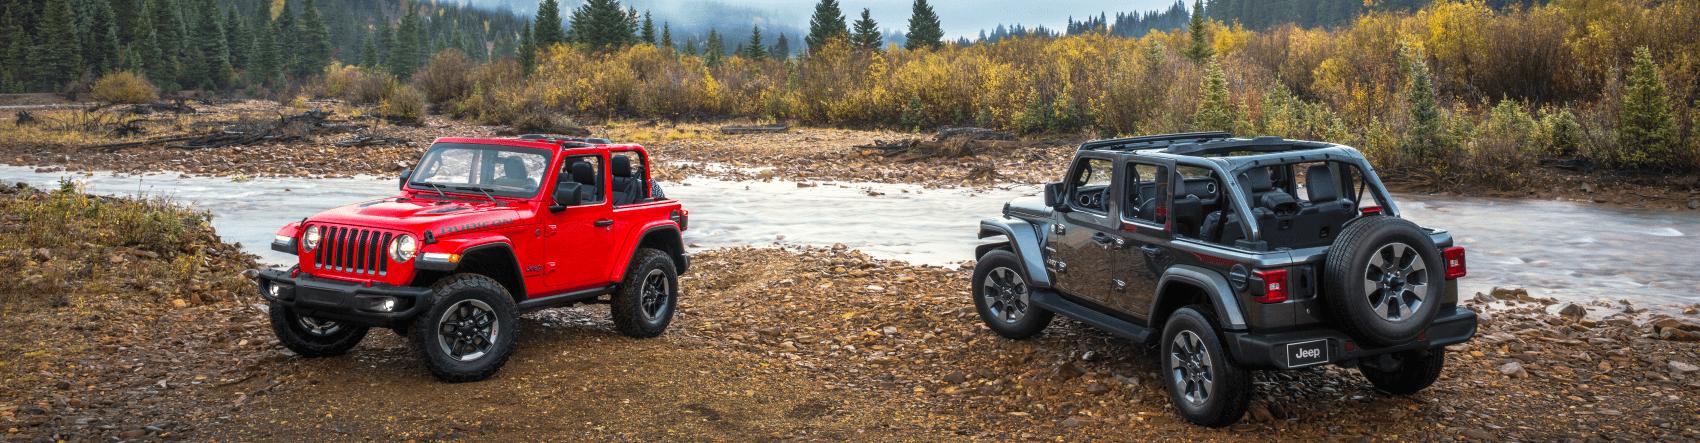 2021 Jeep Wrangler Sahara and Rubicon Mountain Creek C. Harper CDJR